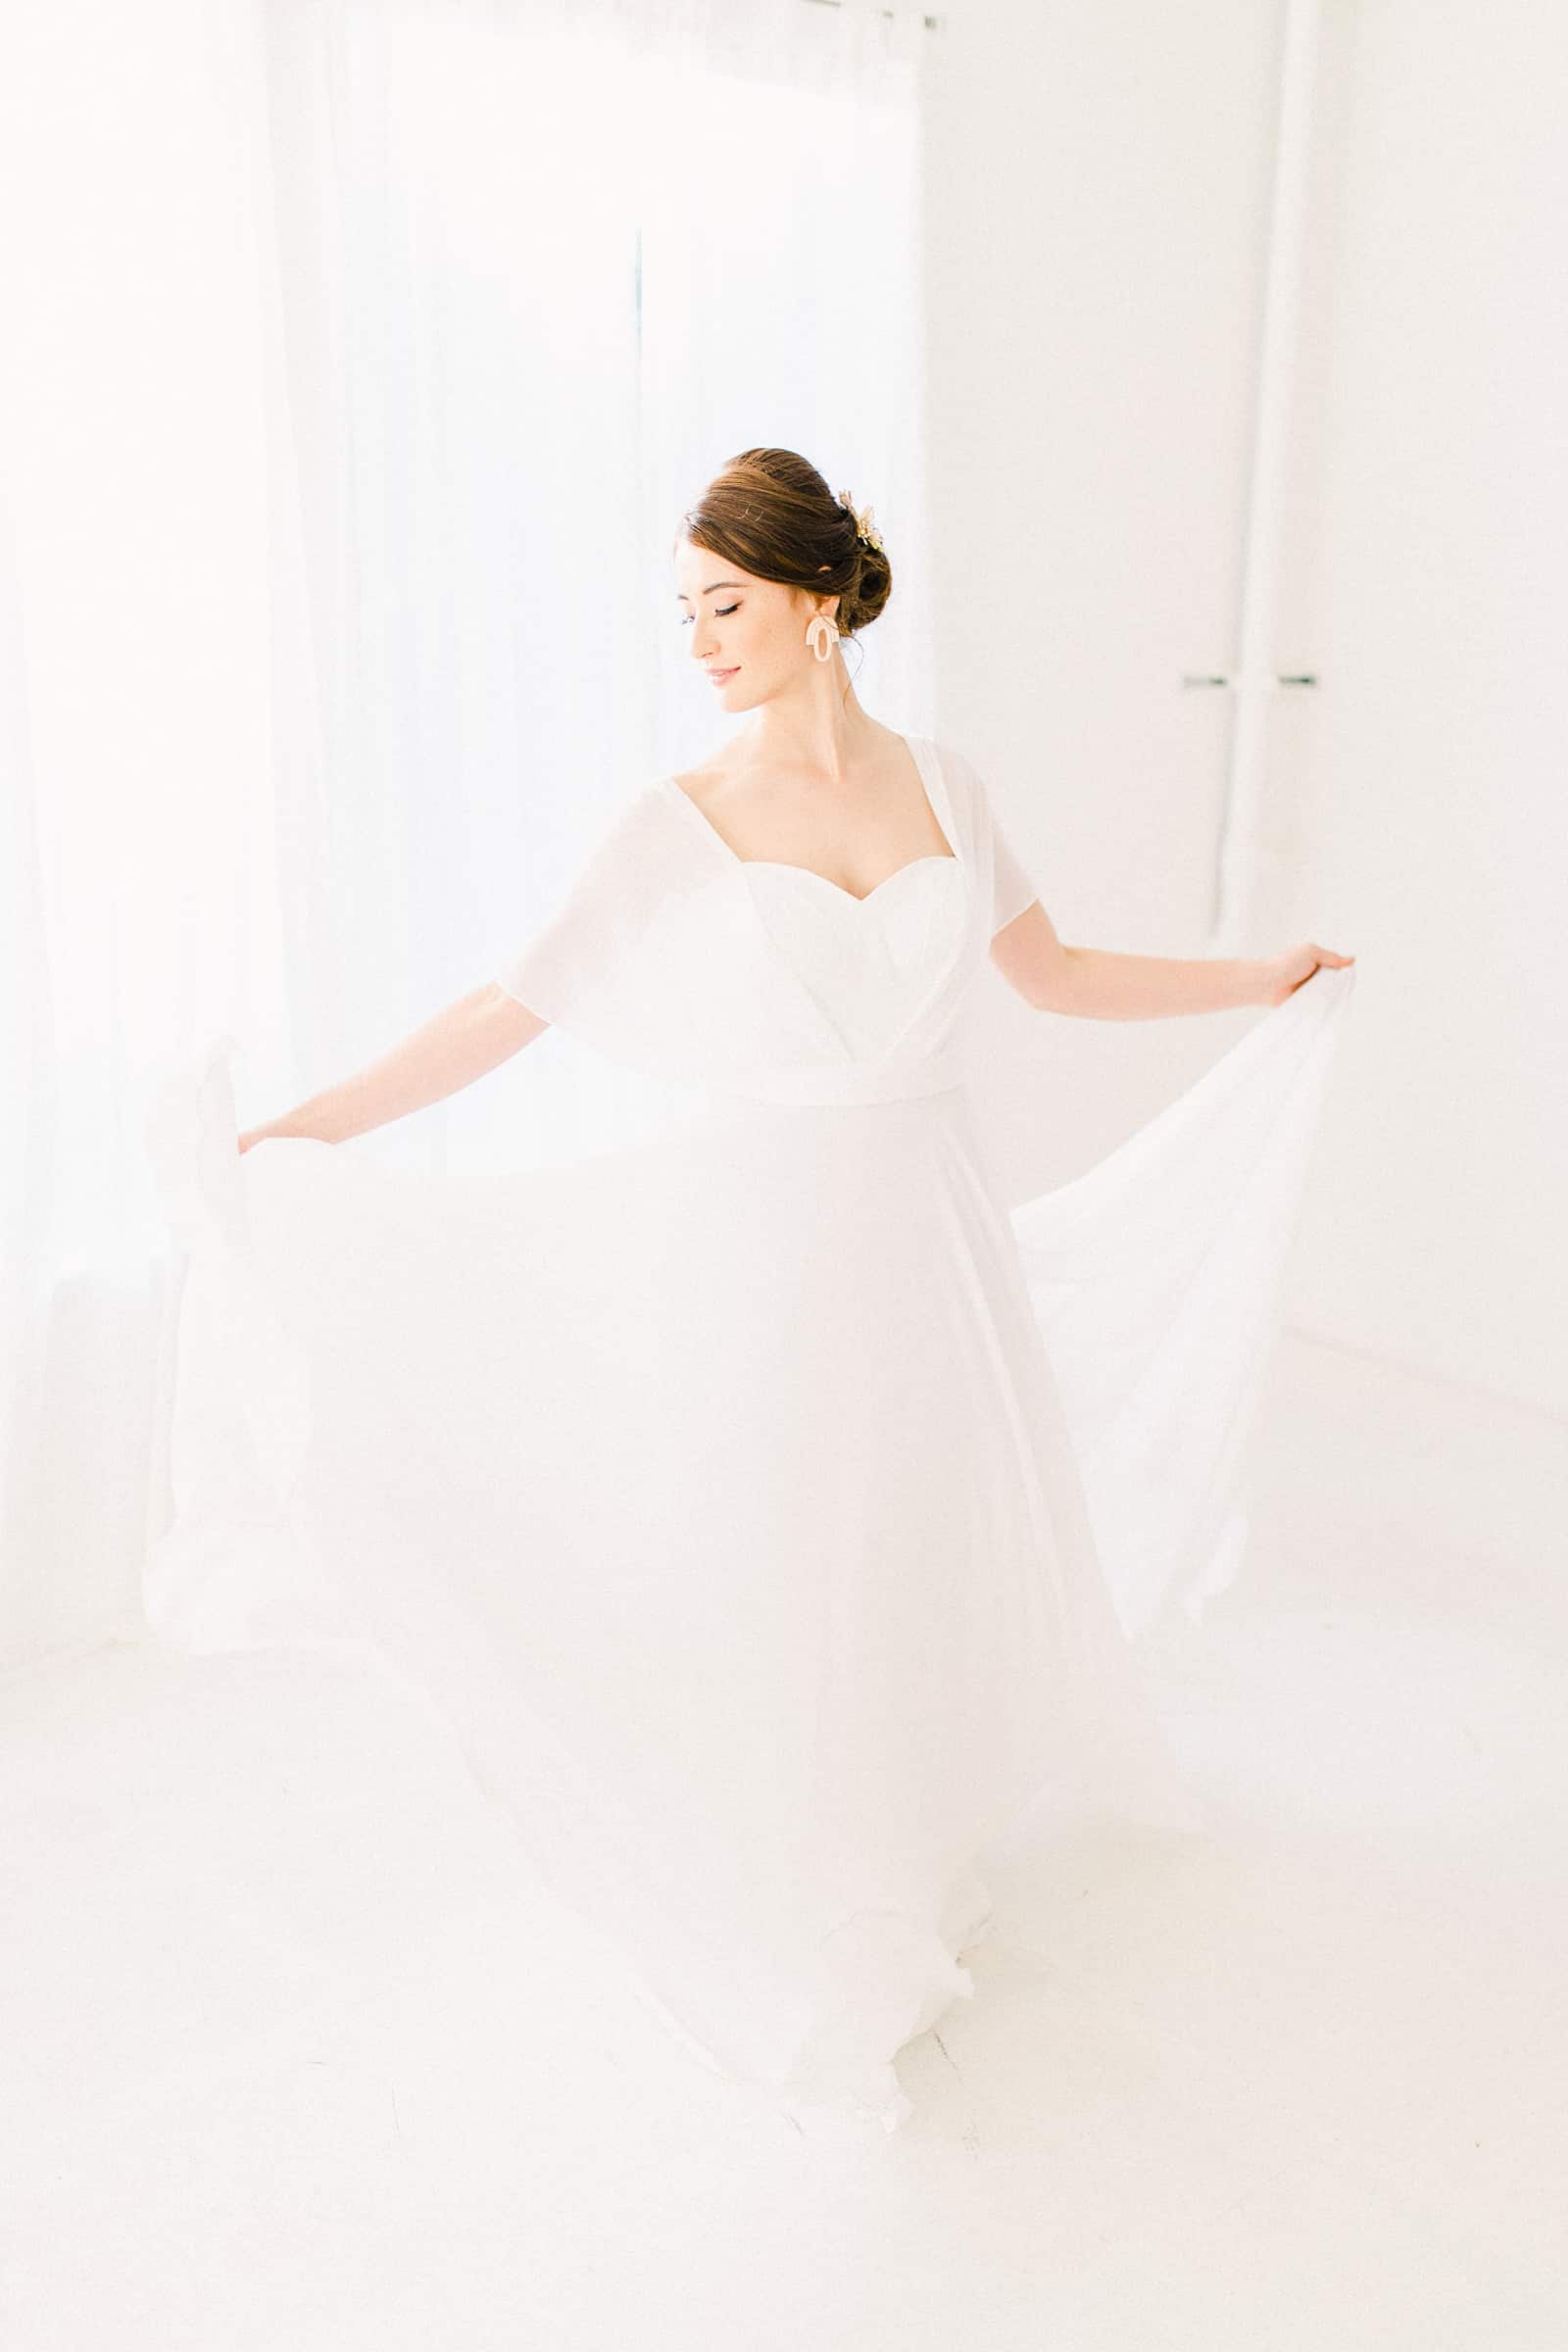 Bride wearing simple modern chiffon flowy wedding dress with sweetheart neckline